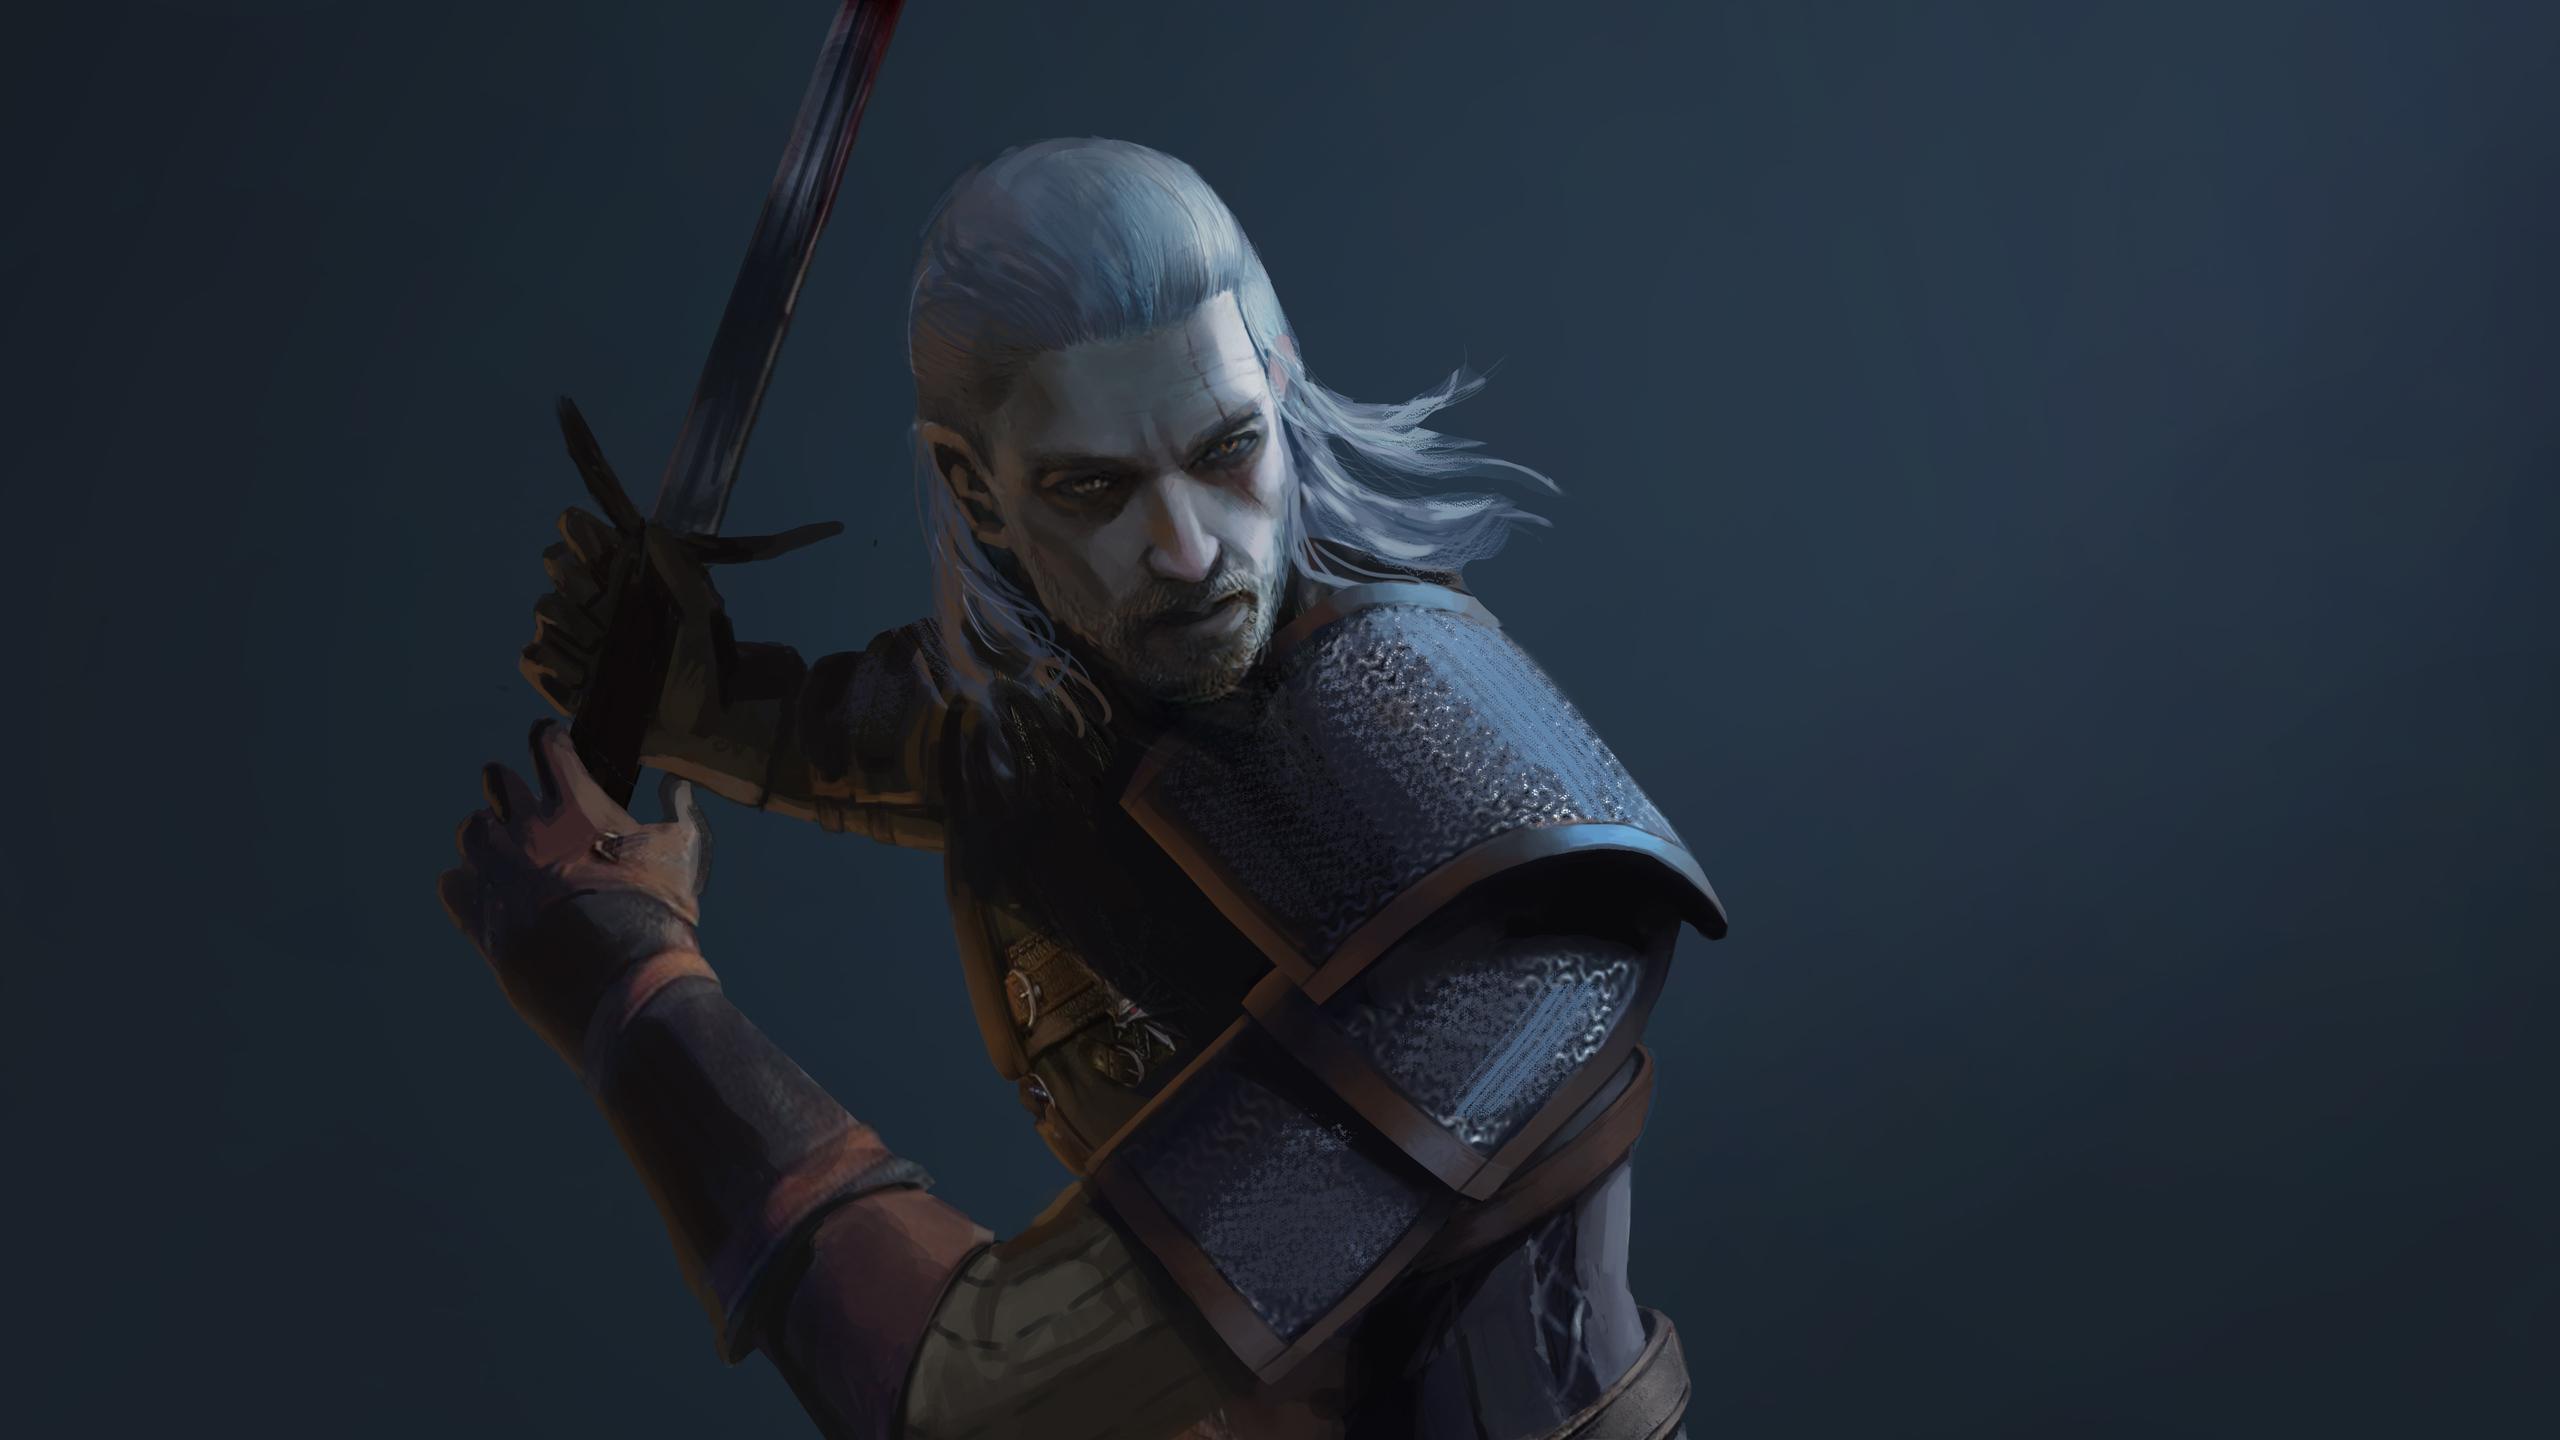 2560x1440 4k Geralt Of Rivia 1440p Resolution Hd 4k